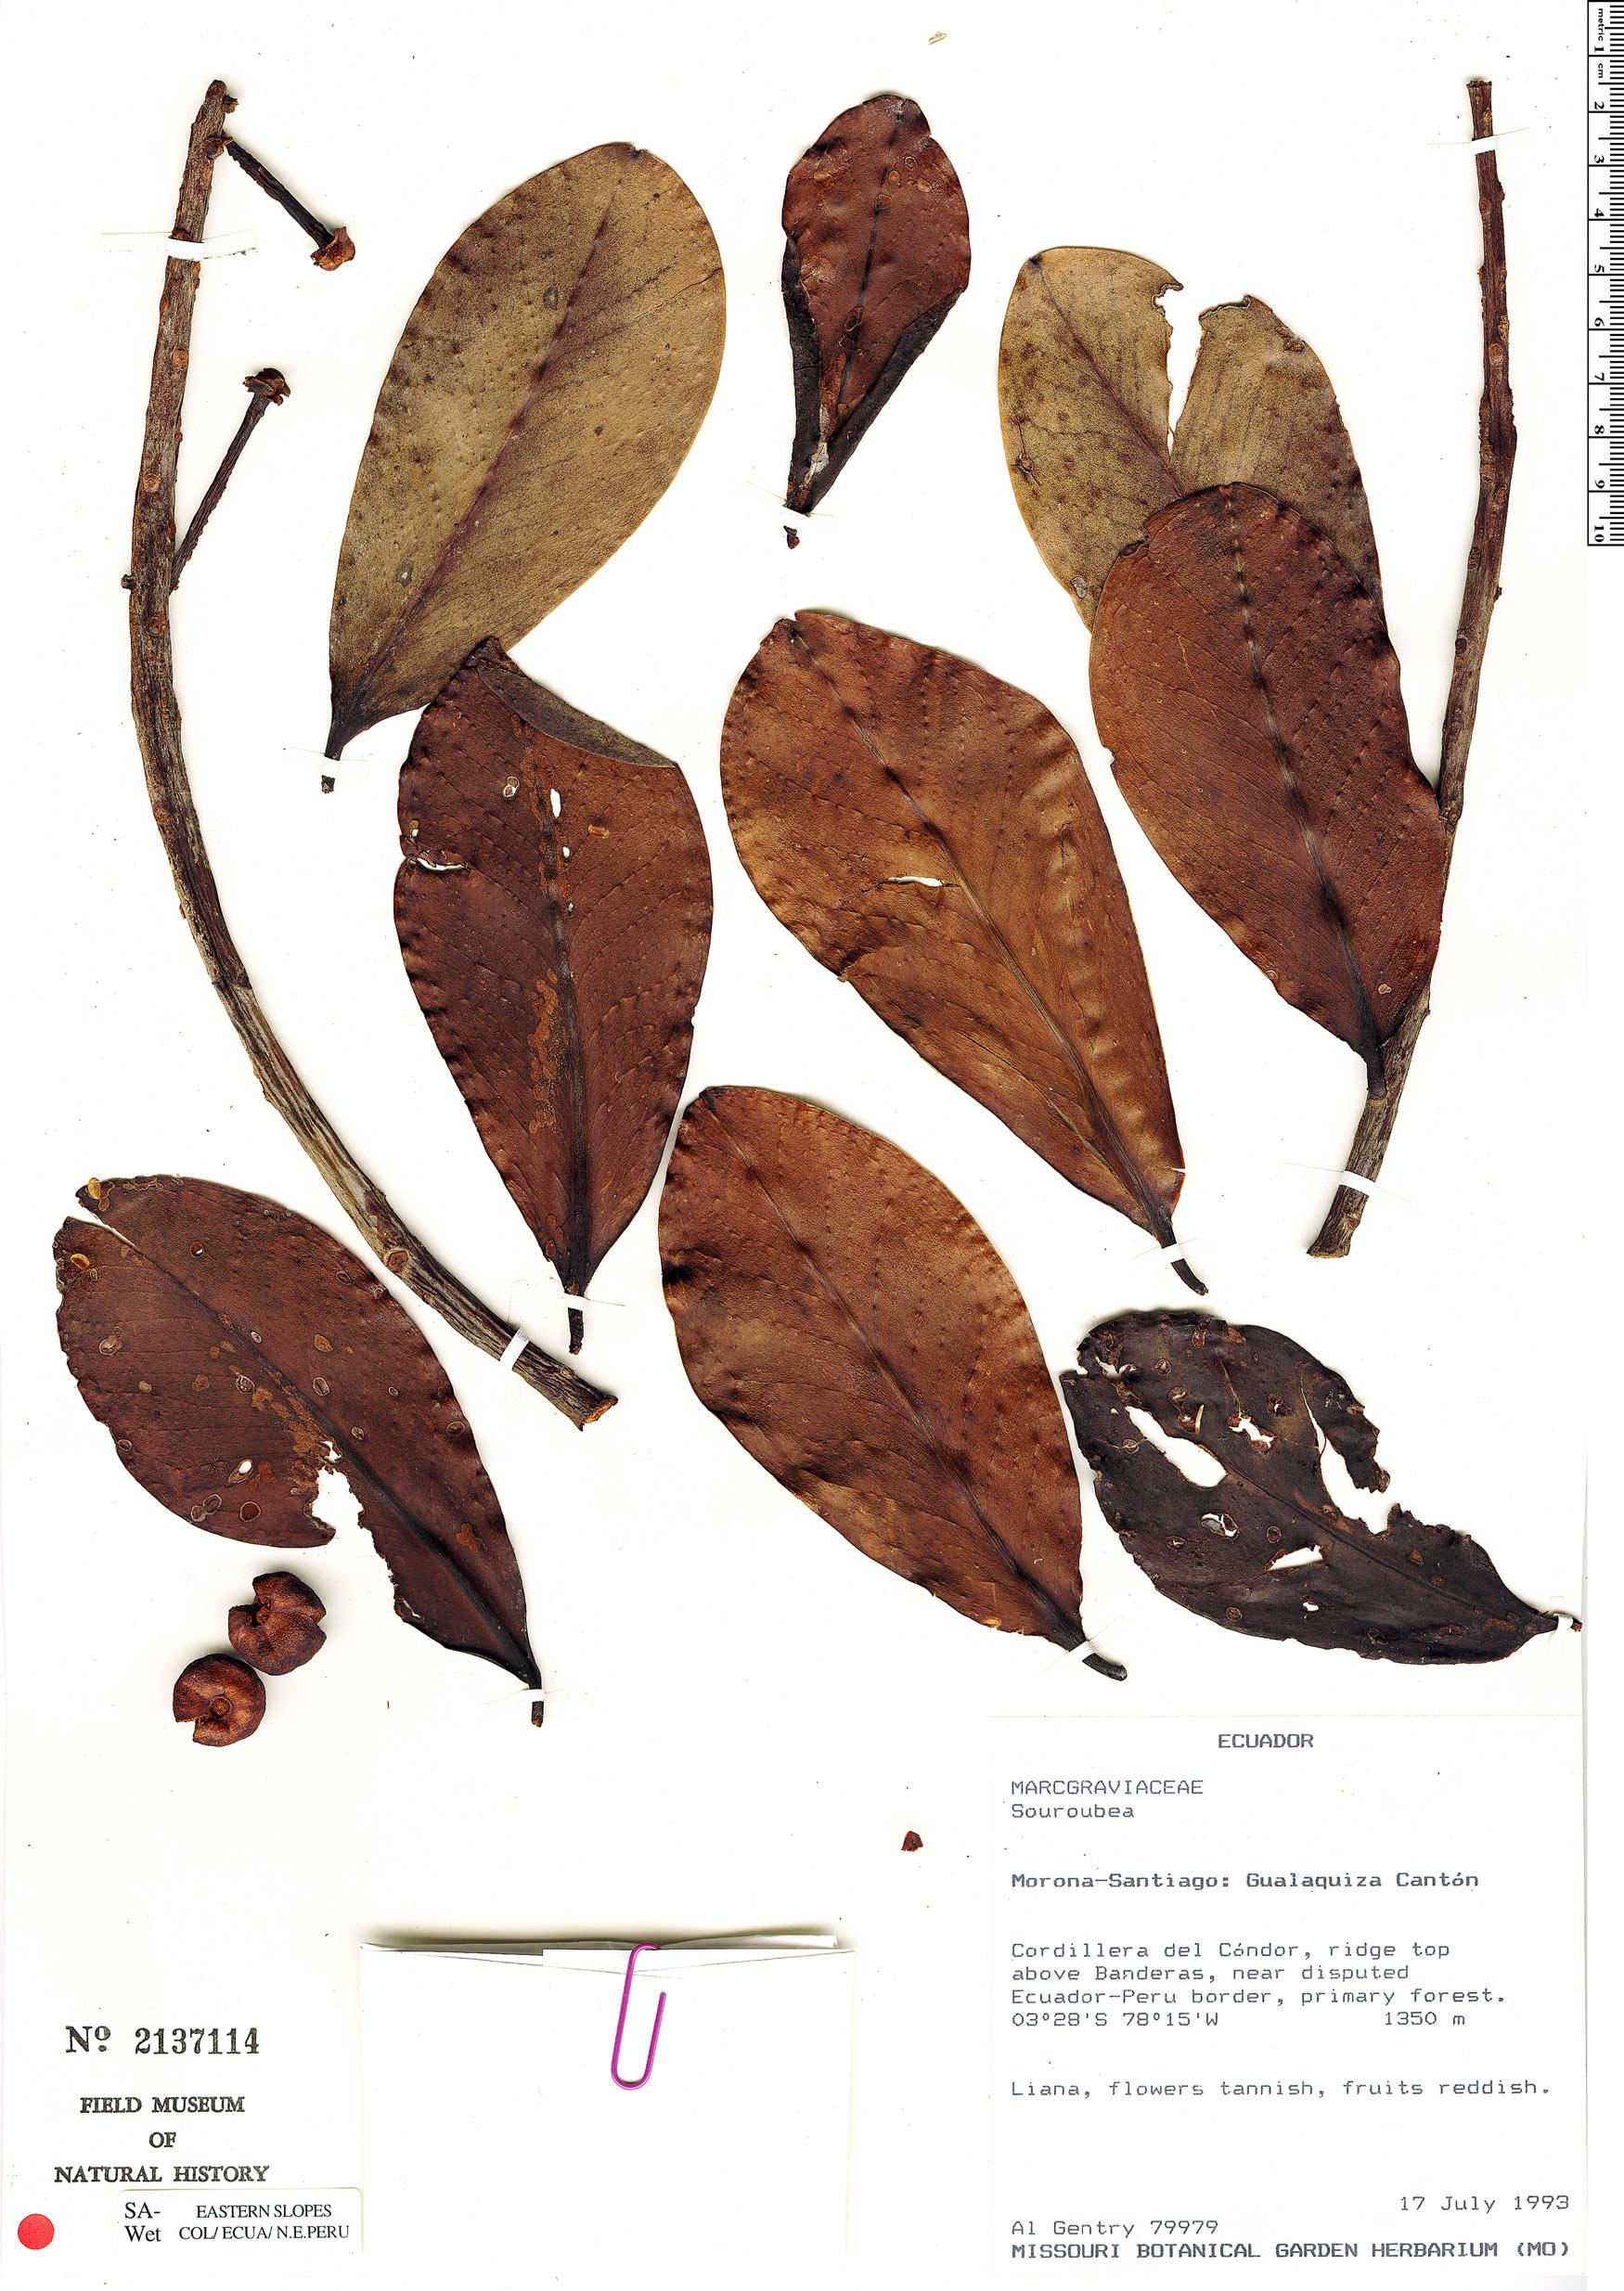 Specimen: Souroubea pachyphylla